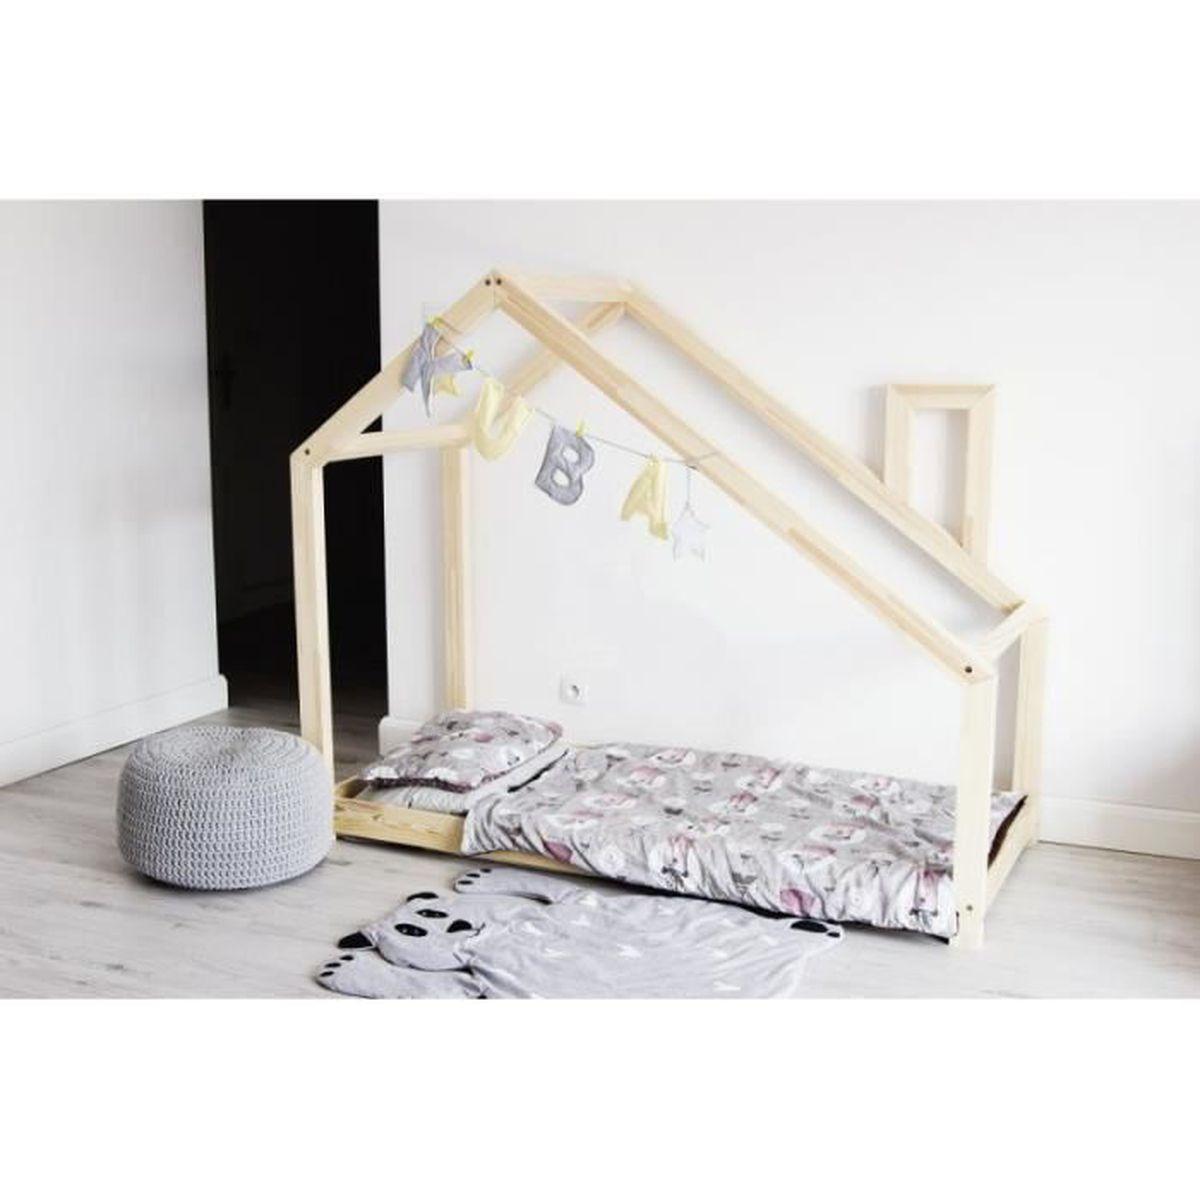 lit cabane bois massif sommier 80x180 achat vente structure de lit lit cabane bois massif. Black Bedroom Furniture Sets. Home Design Ideas